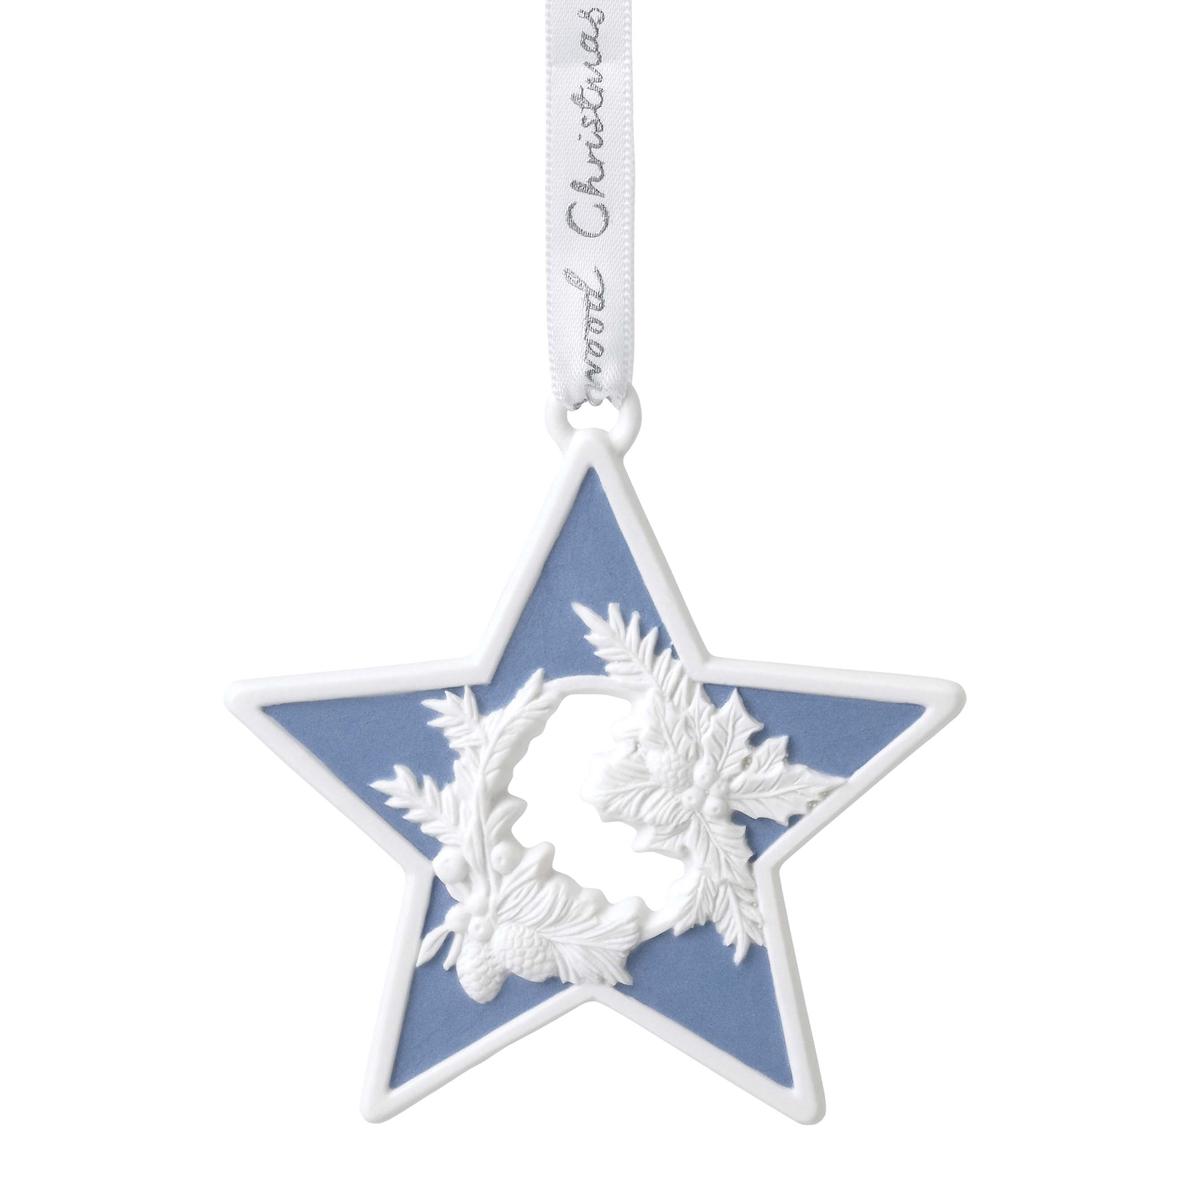 Wedgwood 2020 Figural Star Ornament